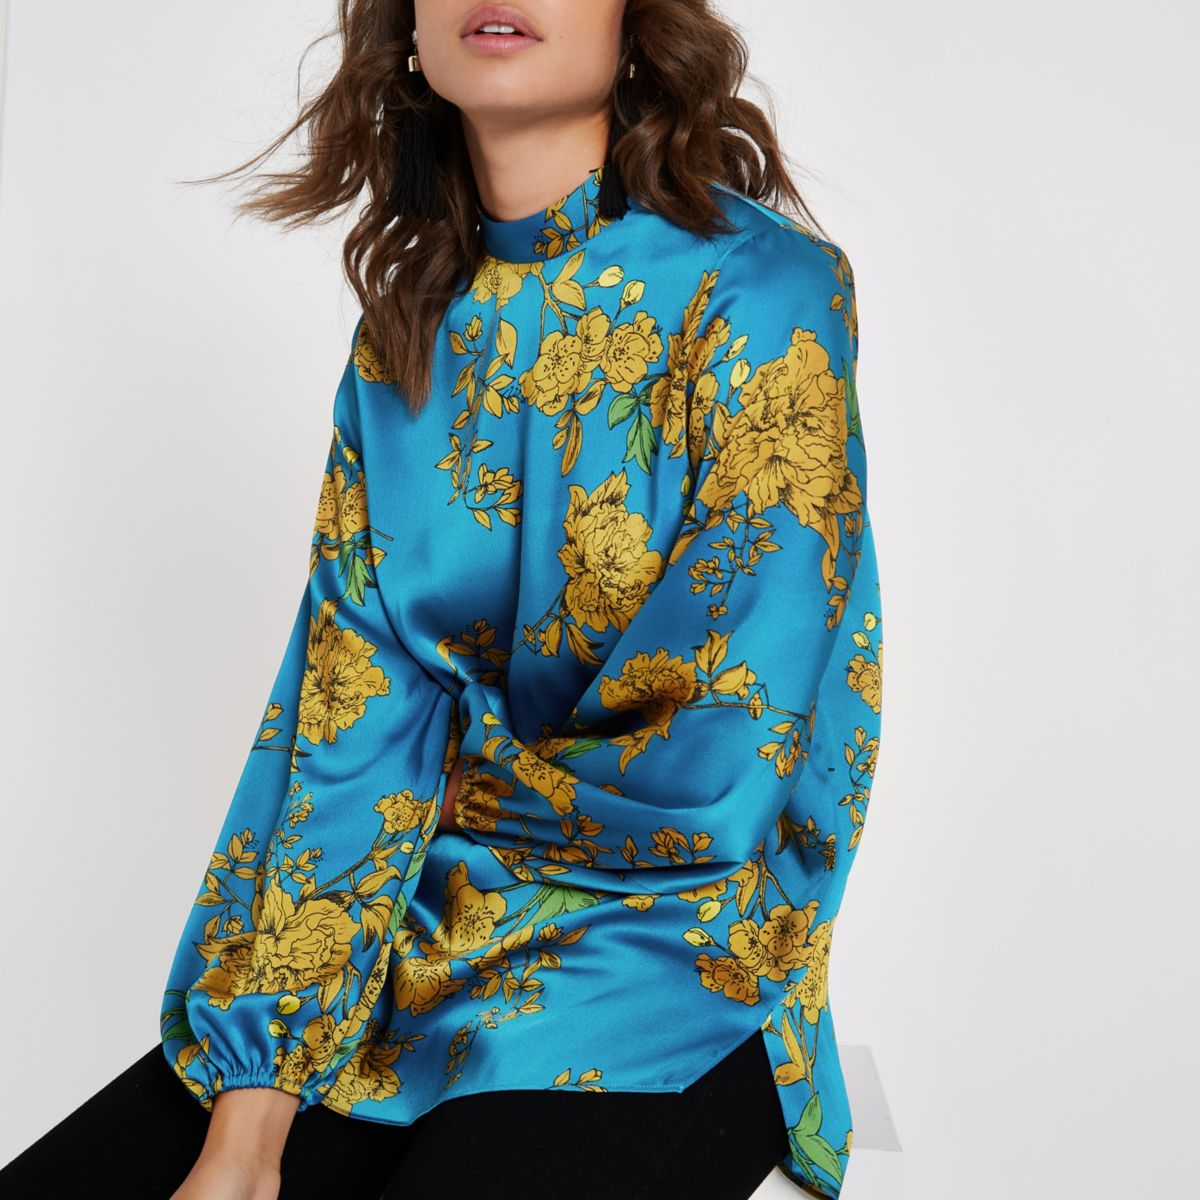 Blue floral high neck top